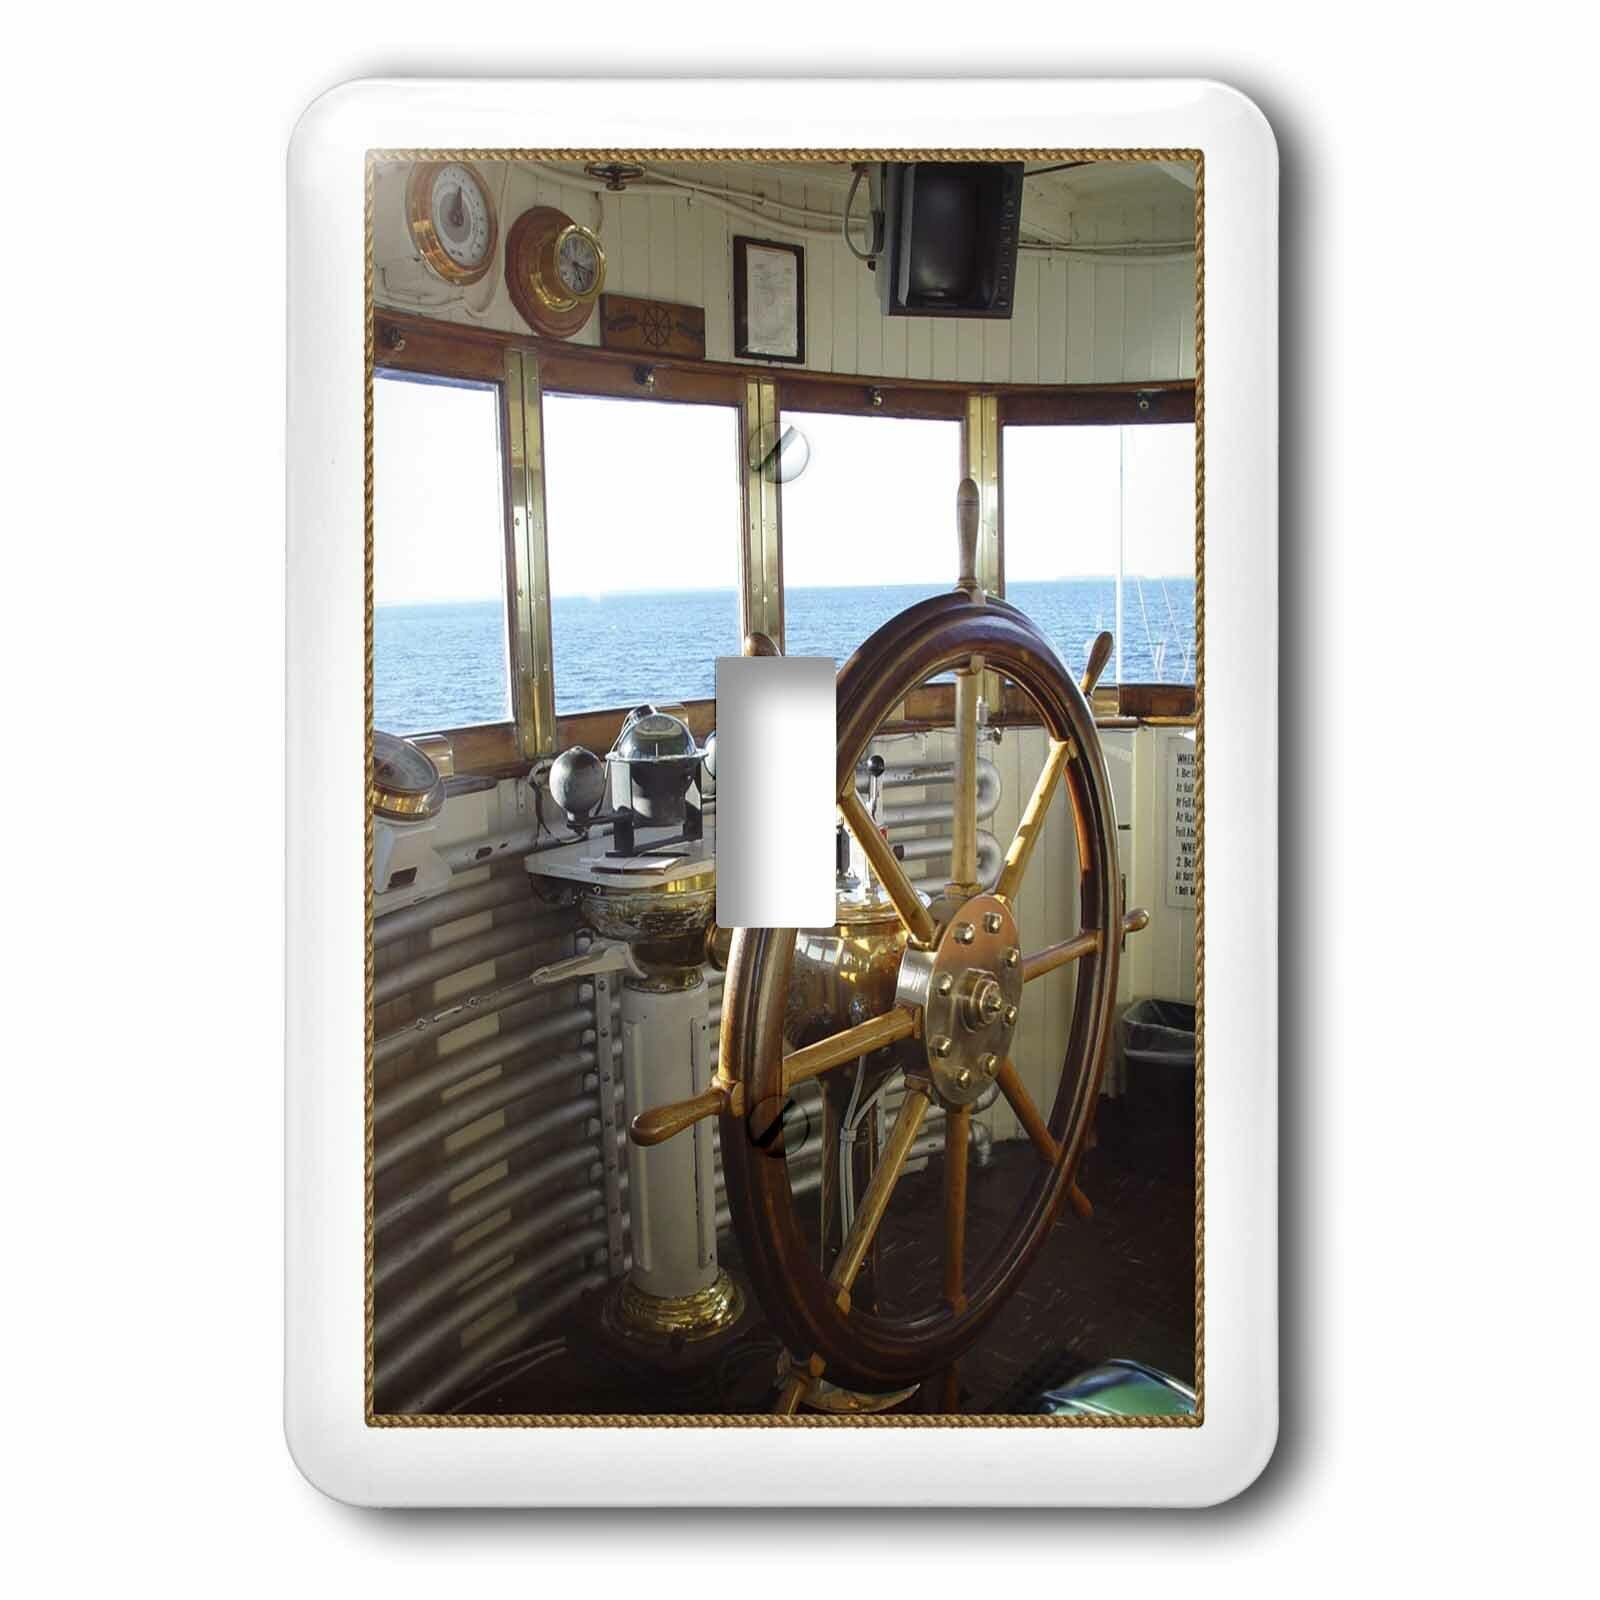 3drose Ships Wheel In Wheelhouse 1 Gang Toggle Light Switch Wall Plate Wayfair